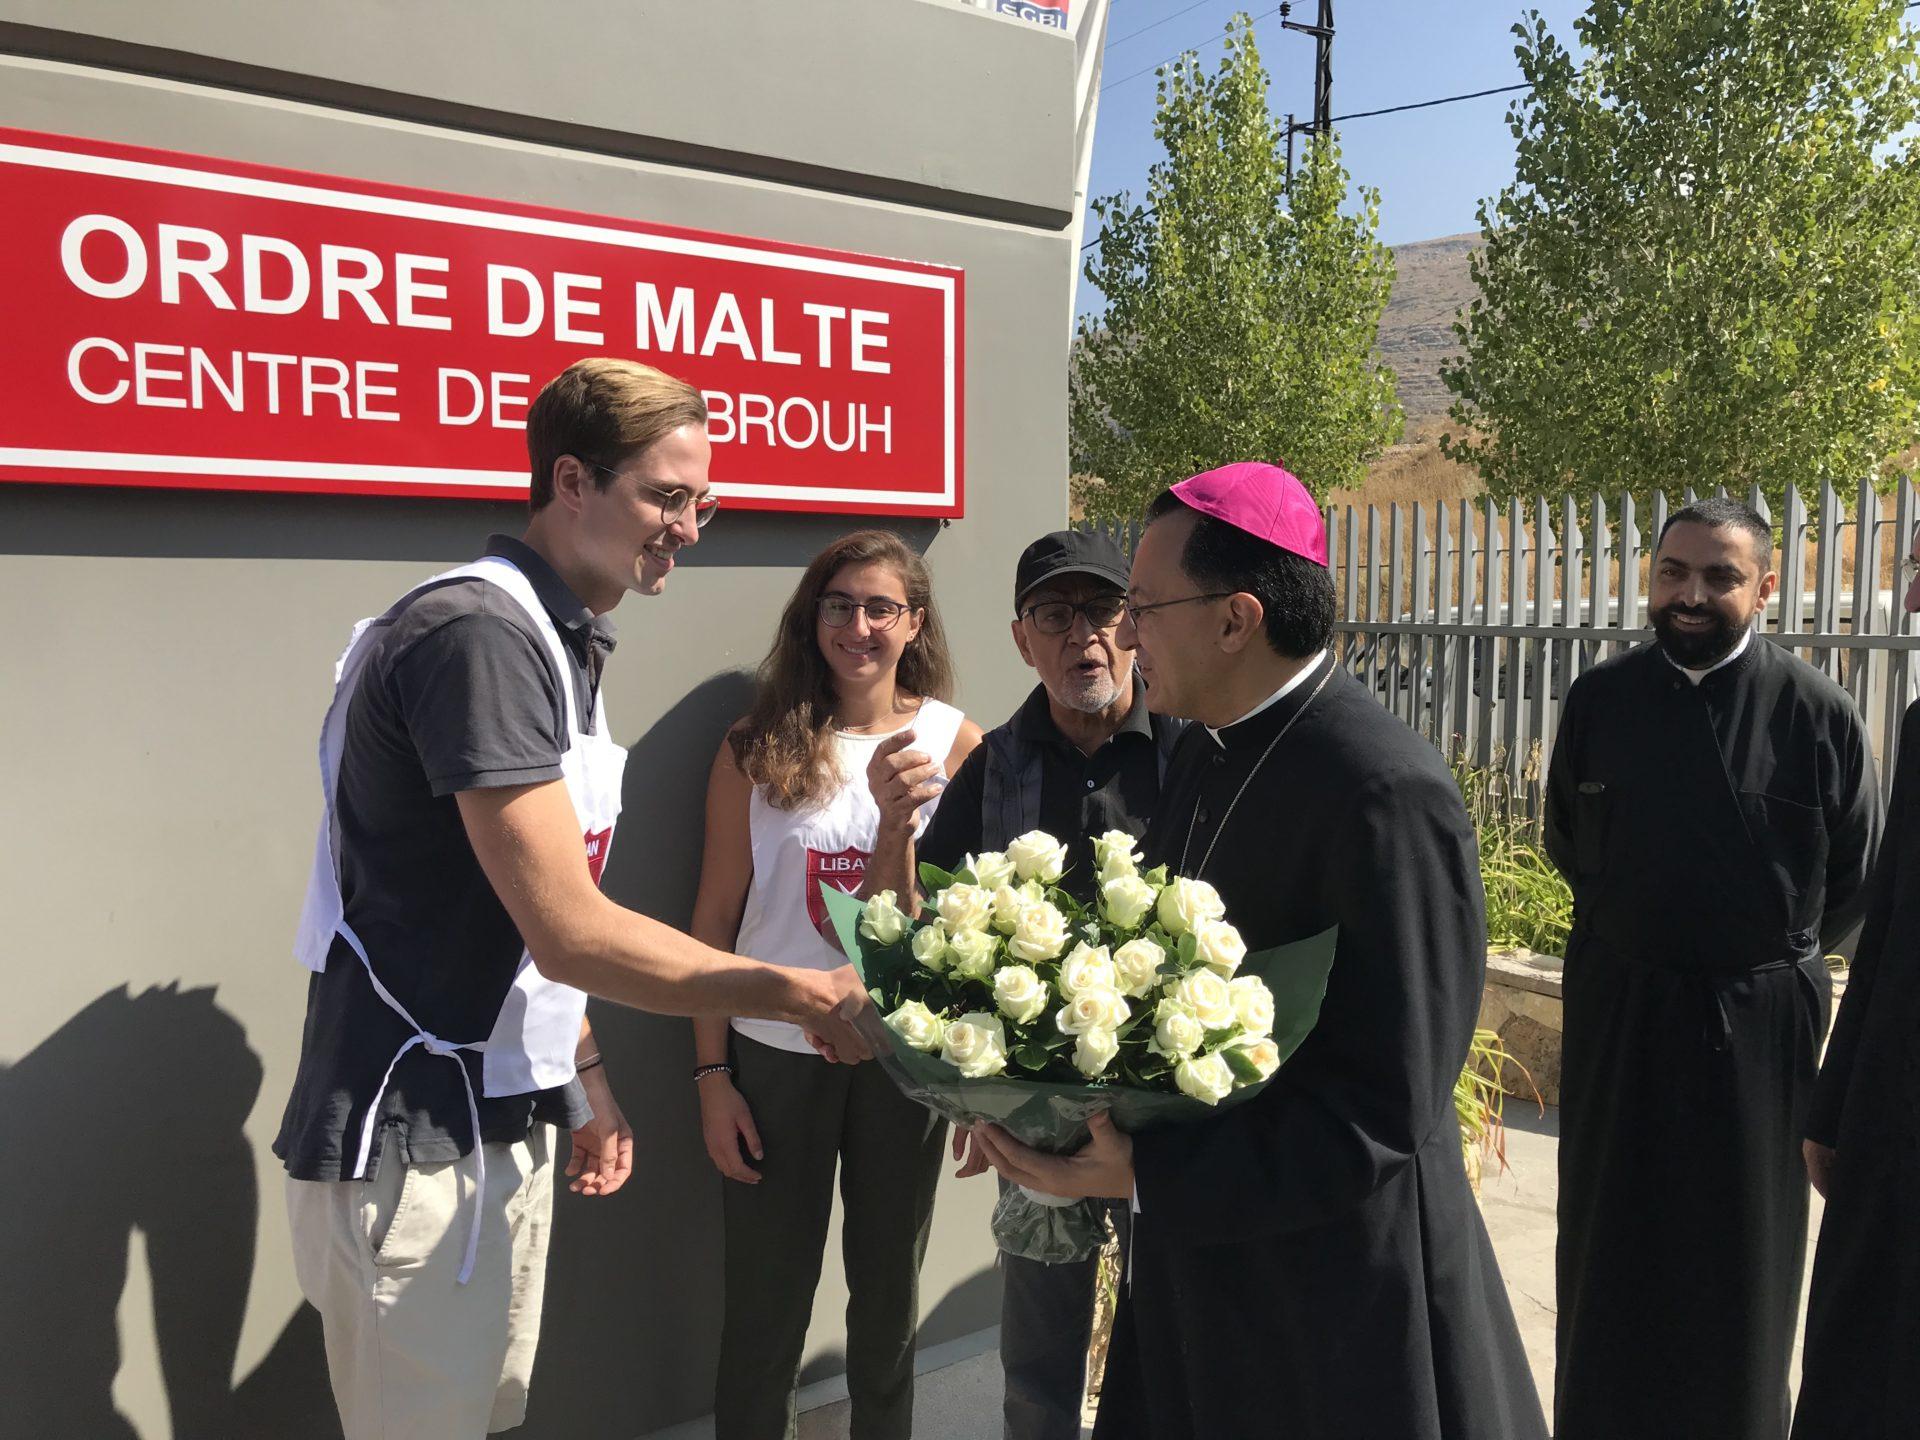 Caritas Pro Vitae Gradu, Charitable Trust, Catholic Humanitarian Project, Ariane Slinger